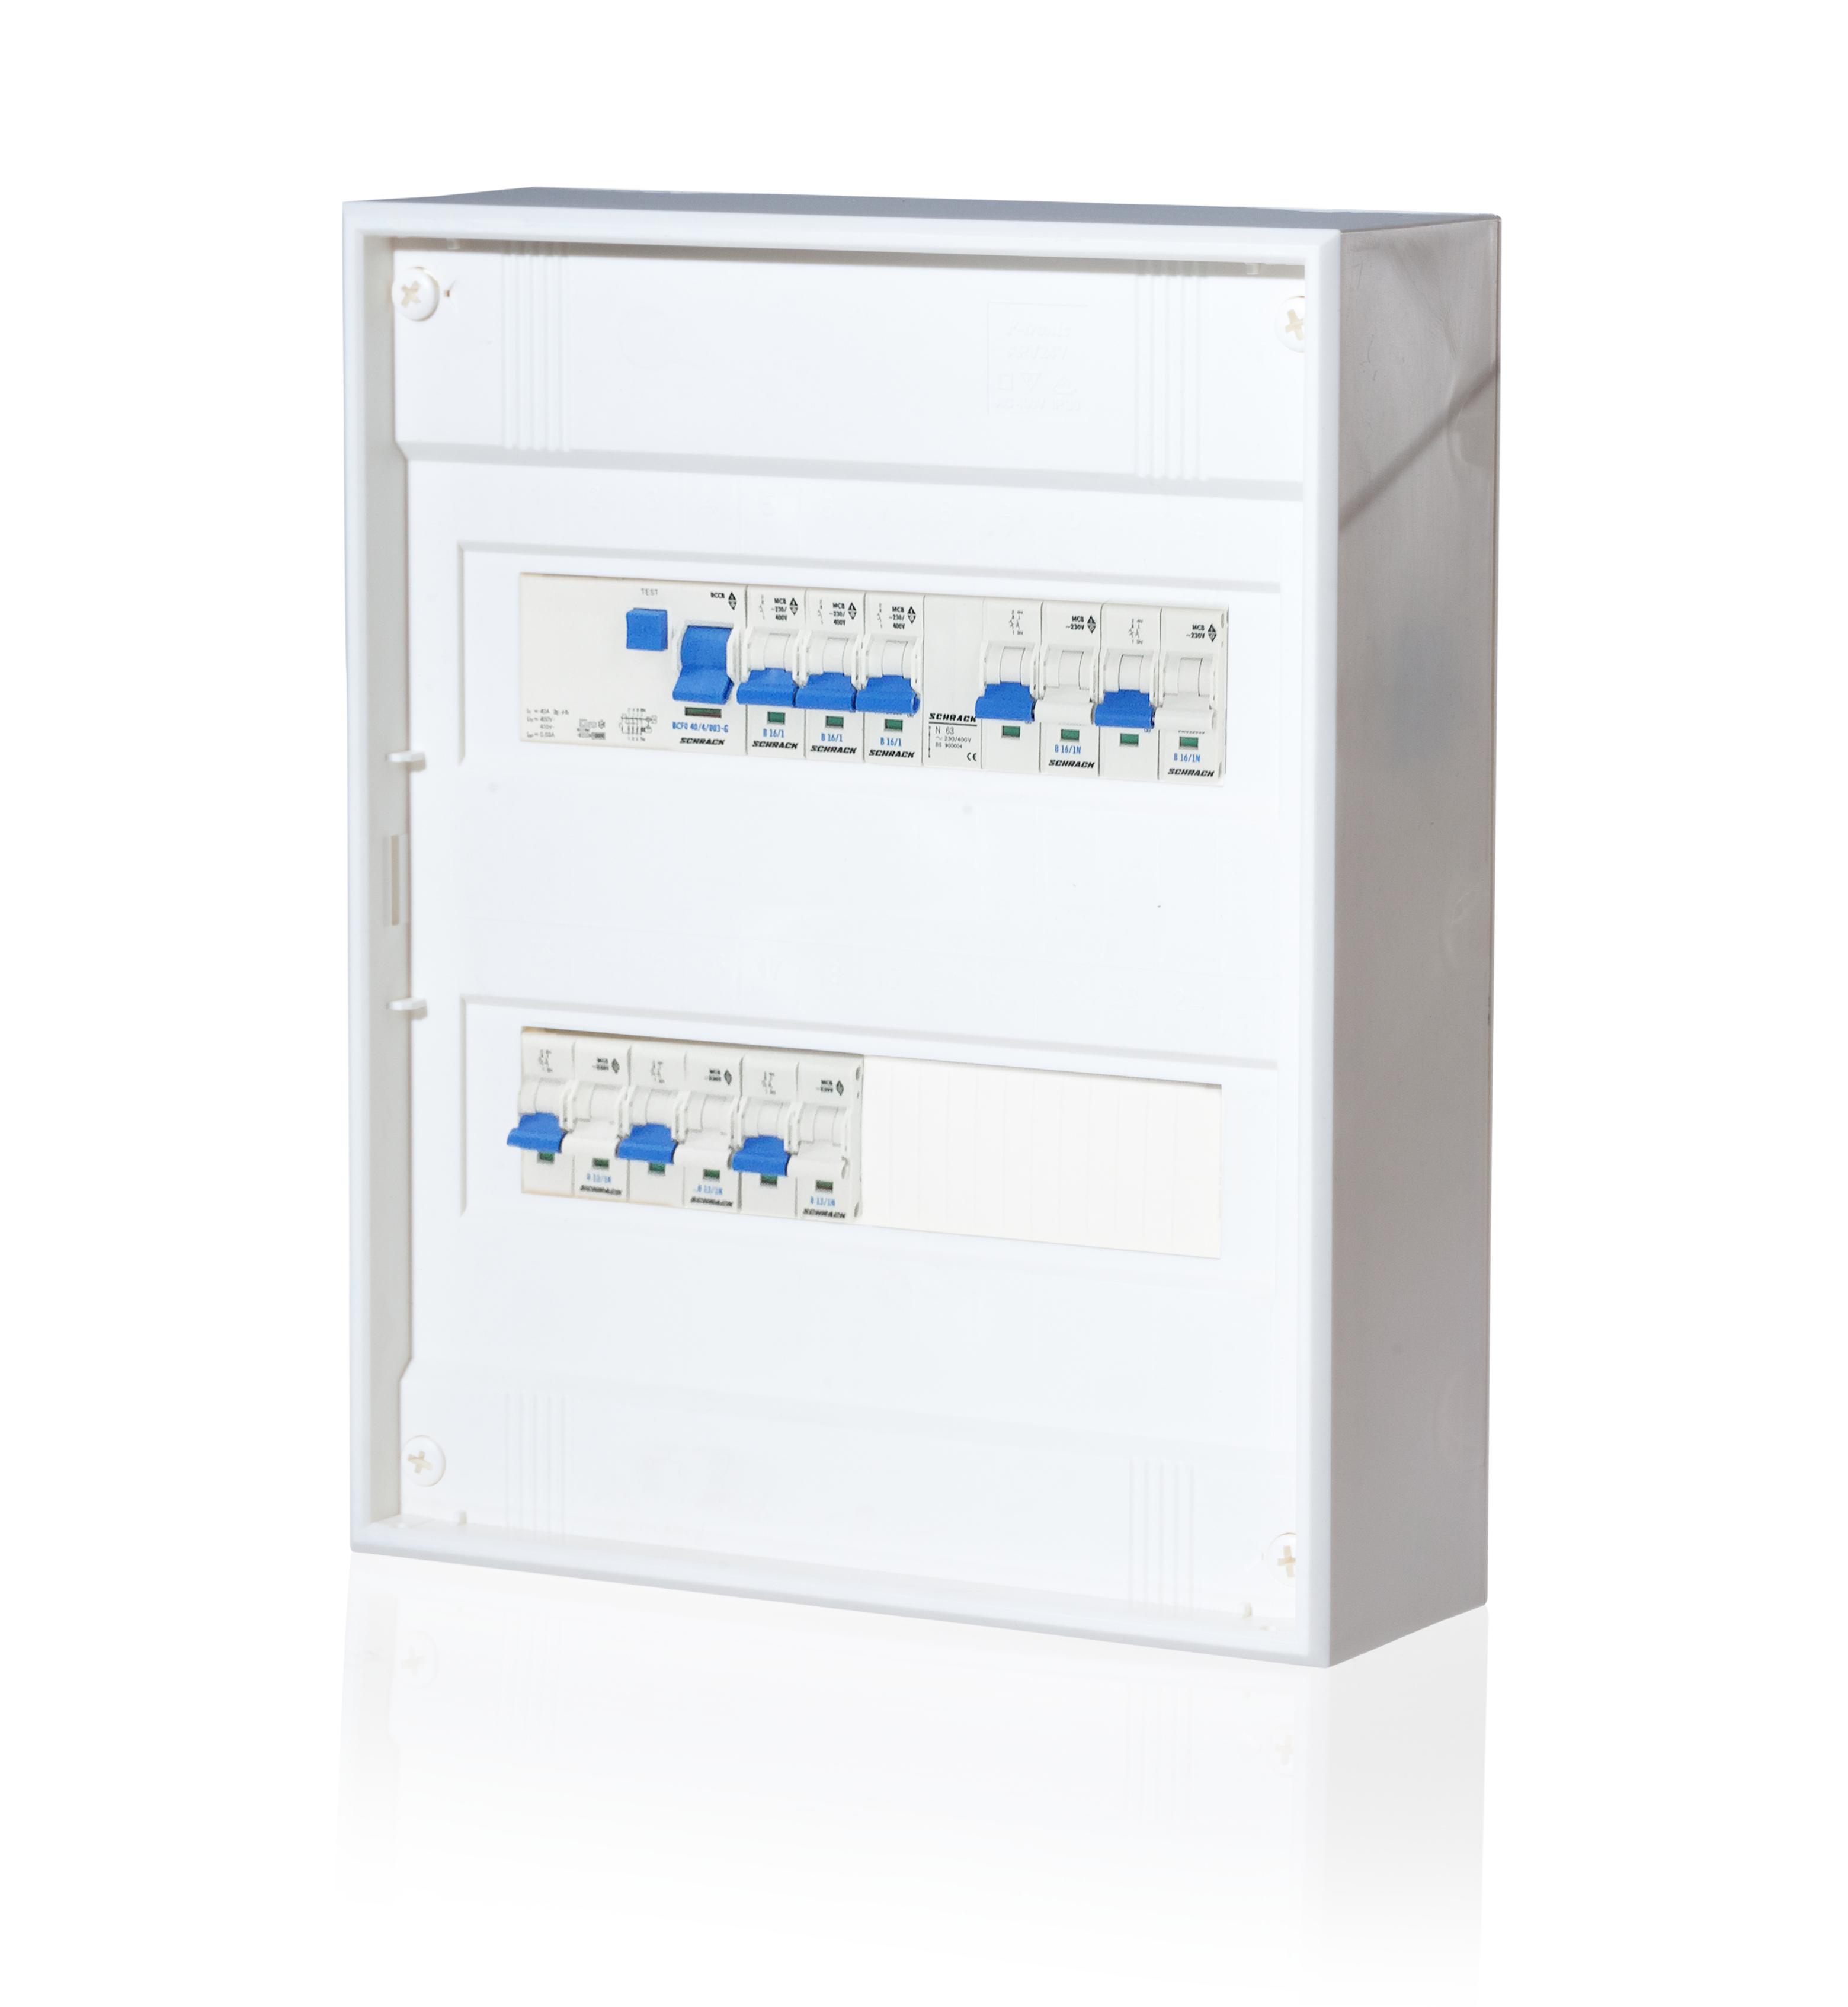 1 Stk AP-Wohnungsverteiler 2-reihig mit FI G, Typ AC BKAP400G--